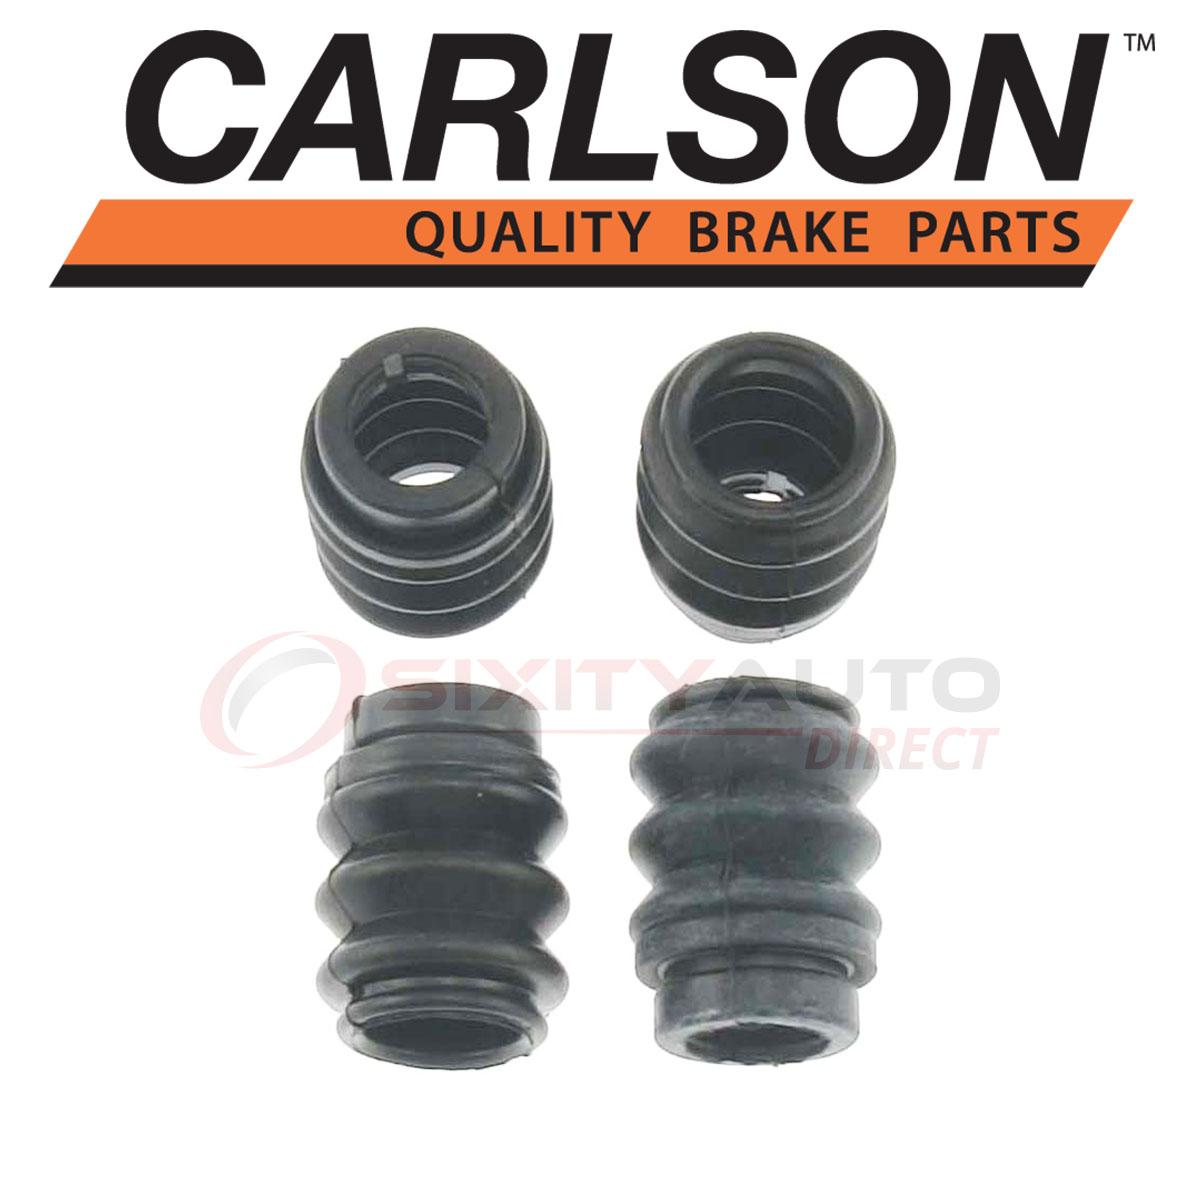 Carlson Rear Brake Caliper Guide Pin Boot Kit For 2005